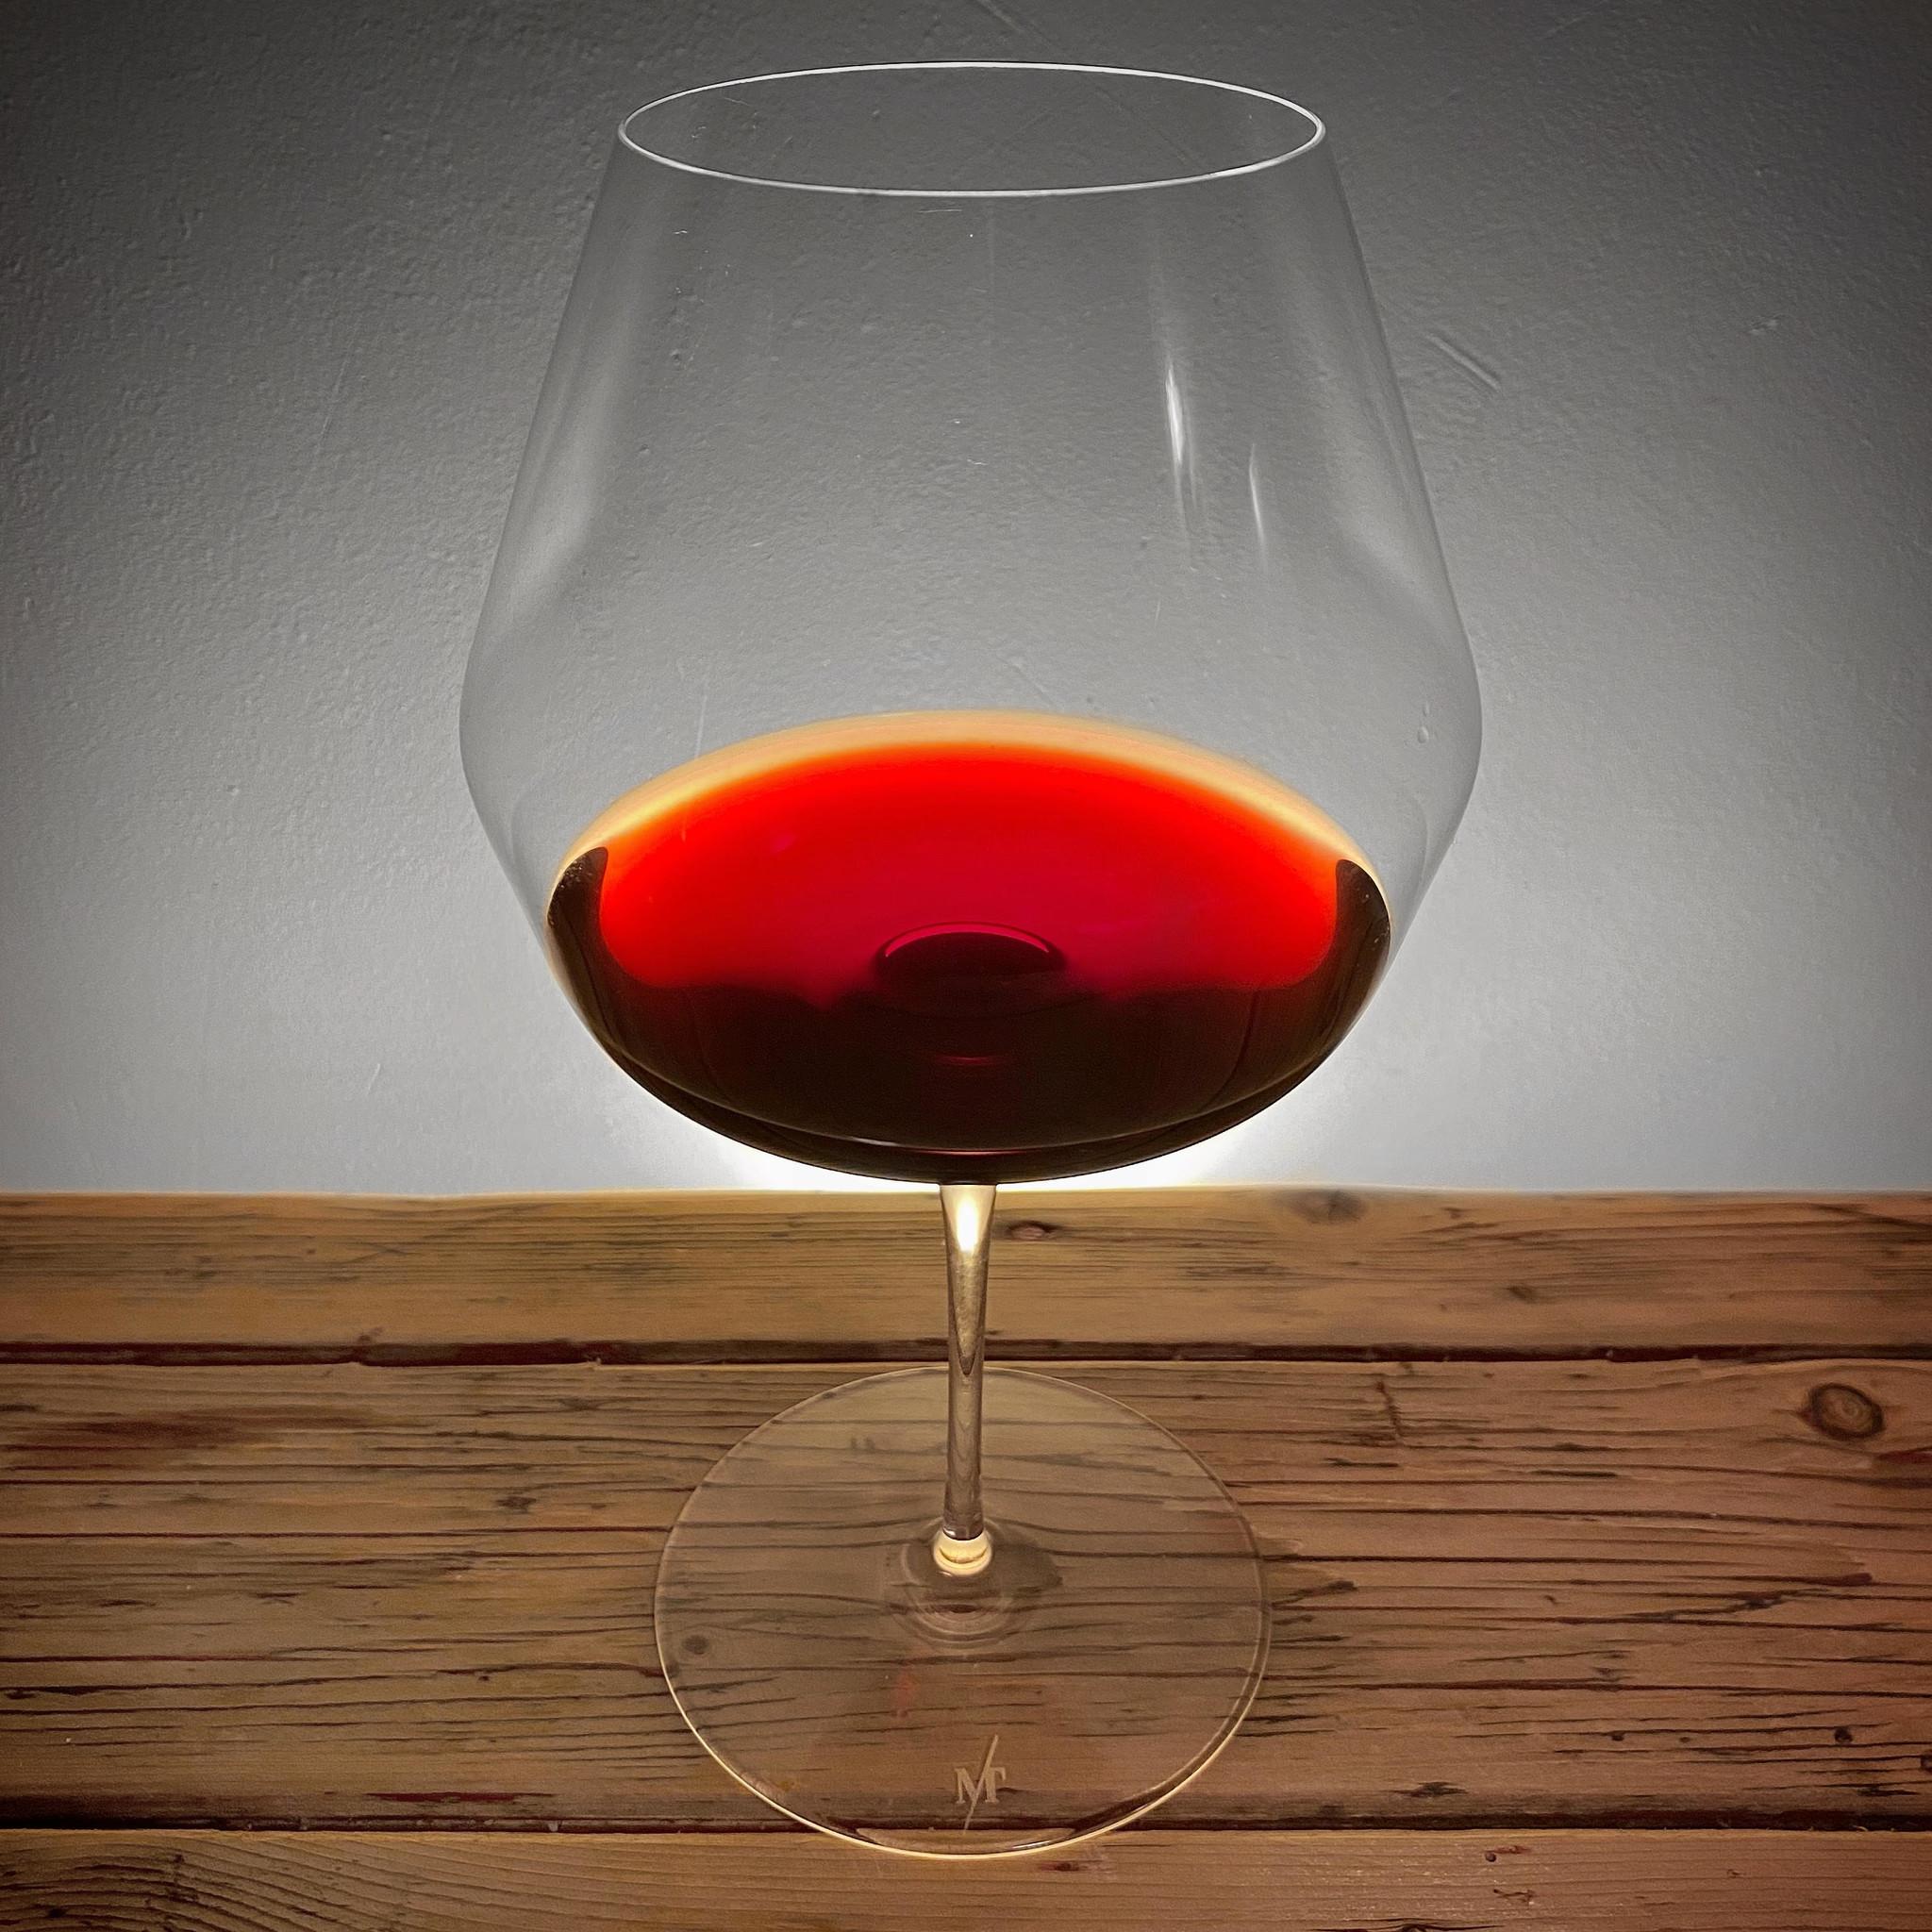 scheuermann-pinot-in-markthomas-glass